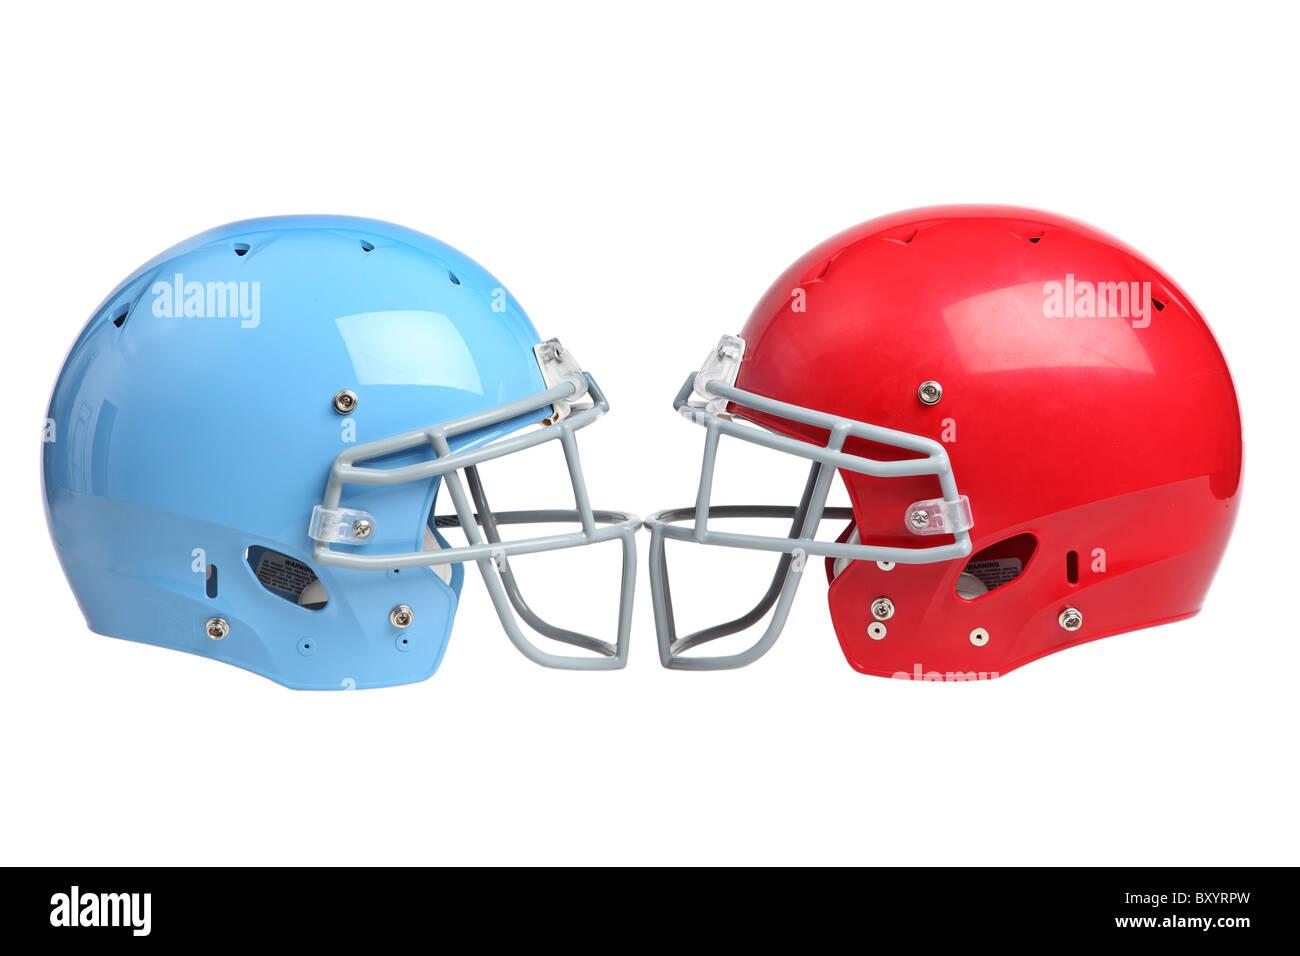 Dos cascos de fútbol americano sobre fondo blanco. Imagen De Stock